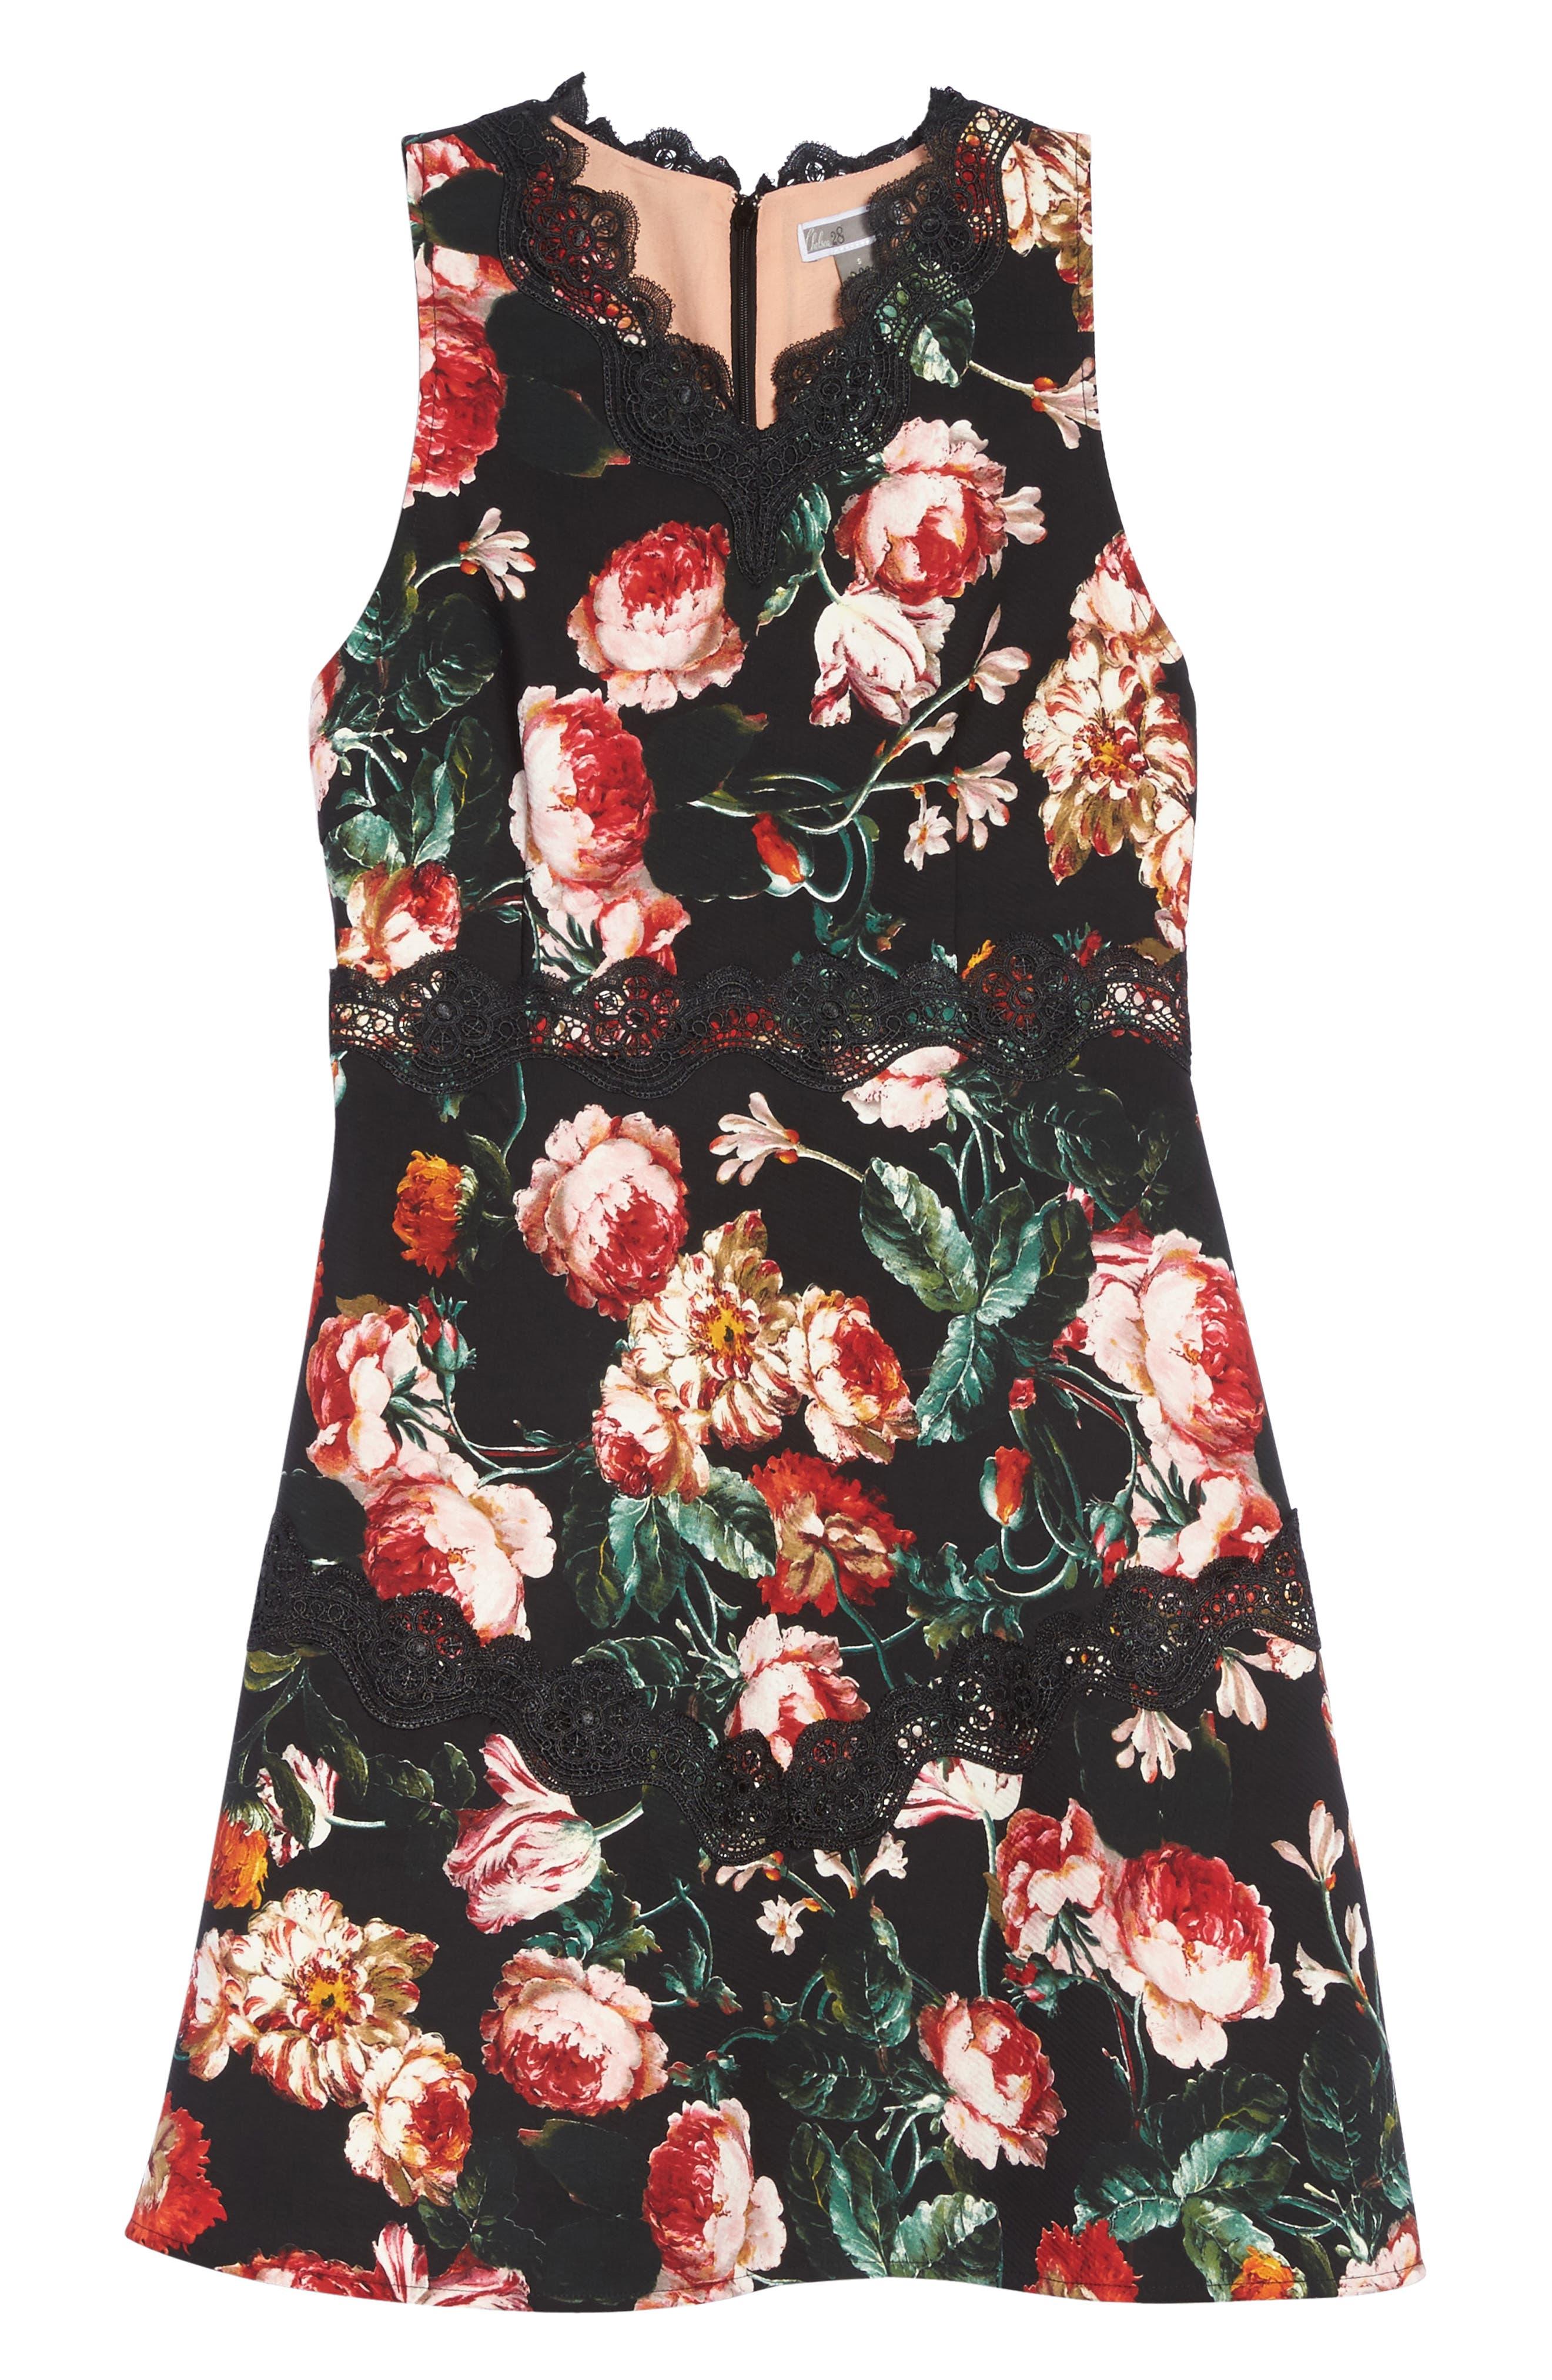 Lace Fit & Flare Dress,                             Alternate thumbnail 6, color,                             Black Foxie Floral